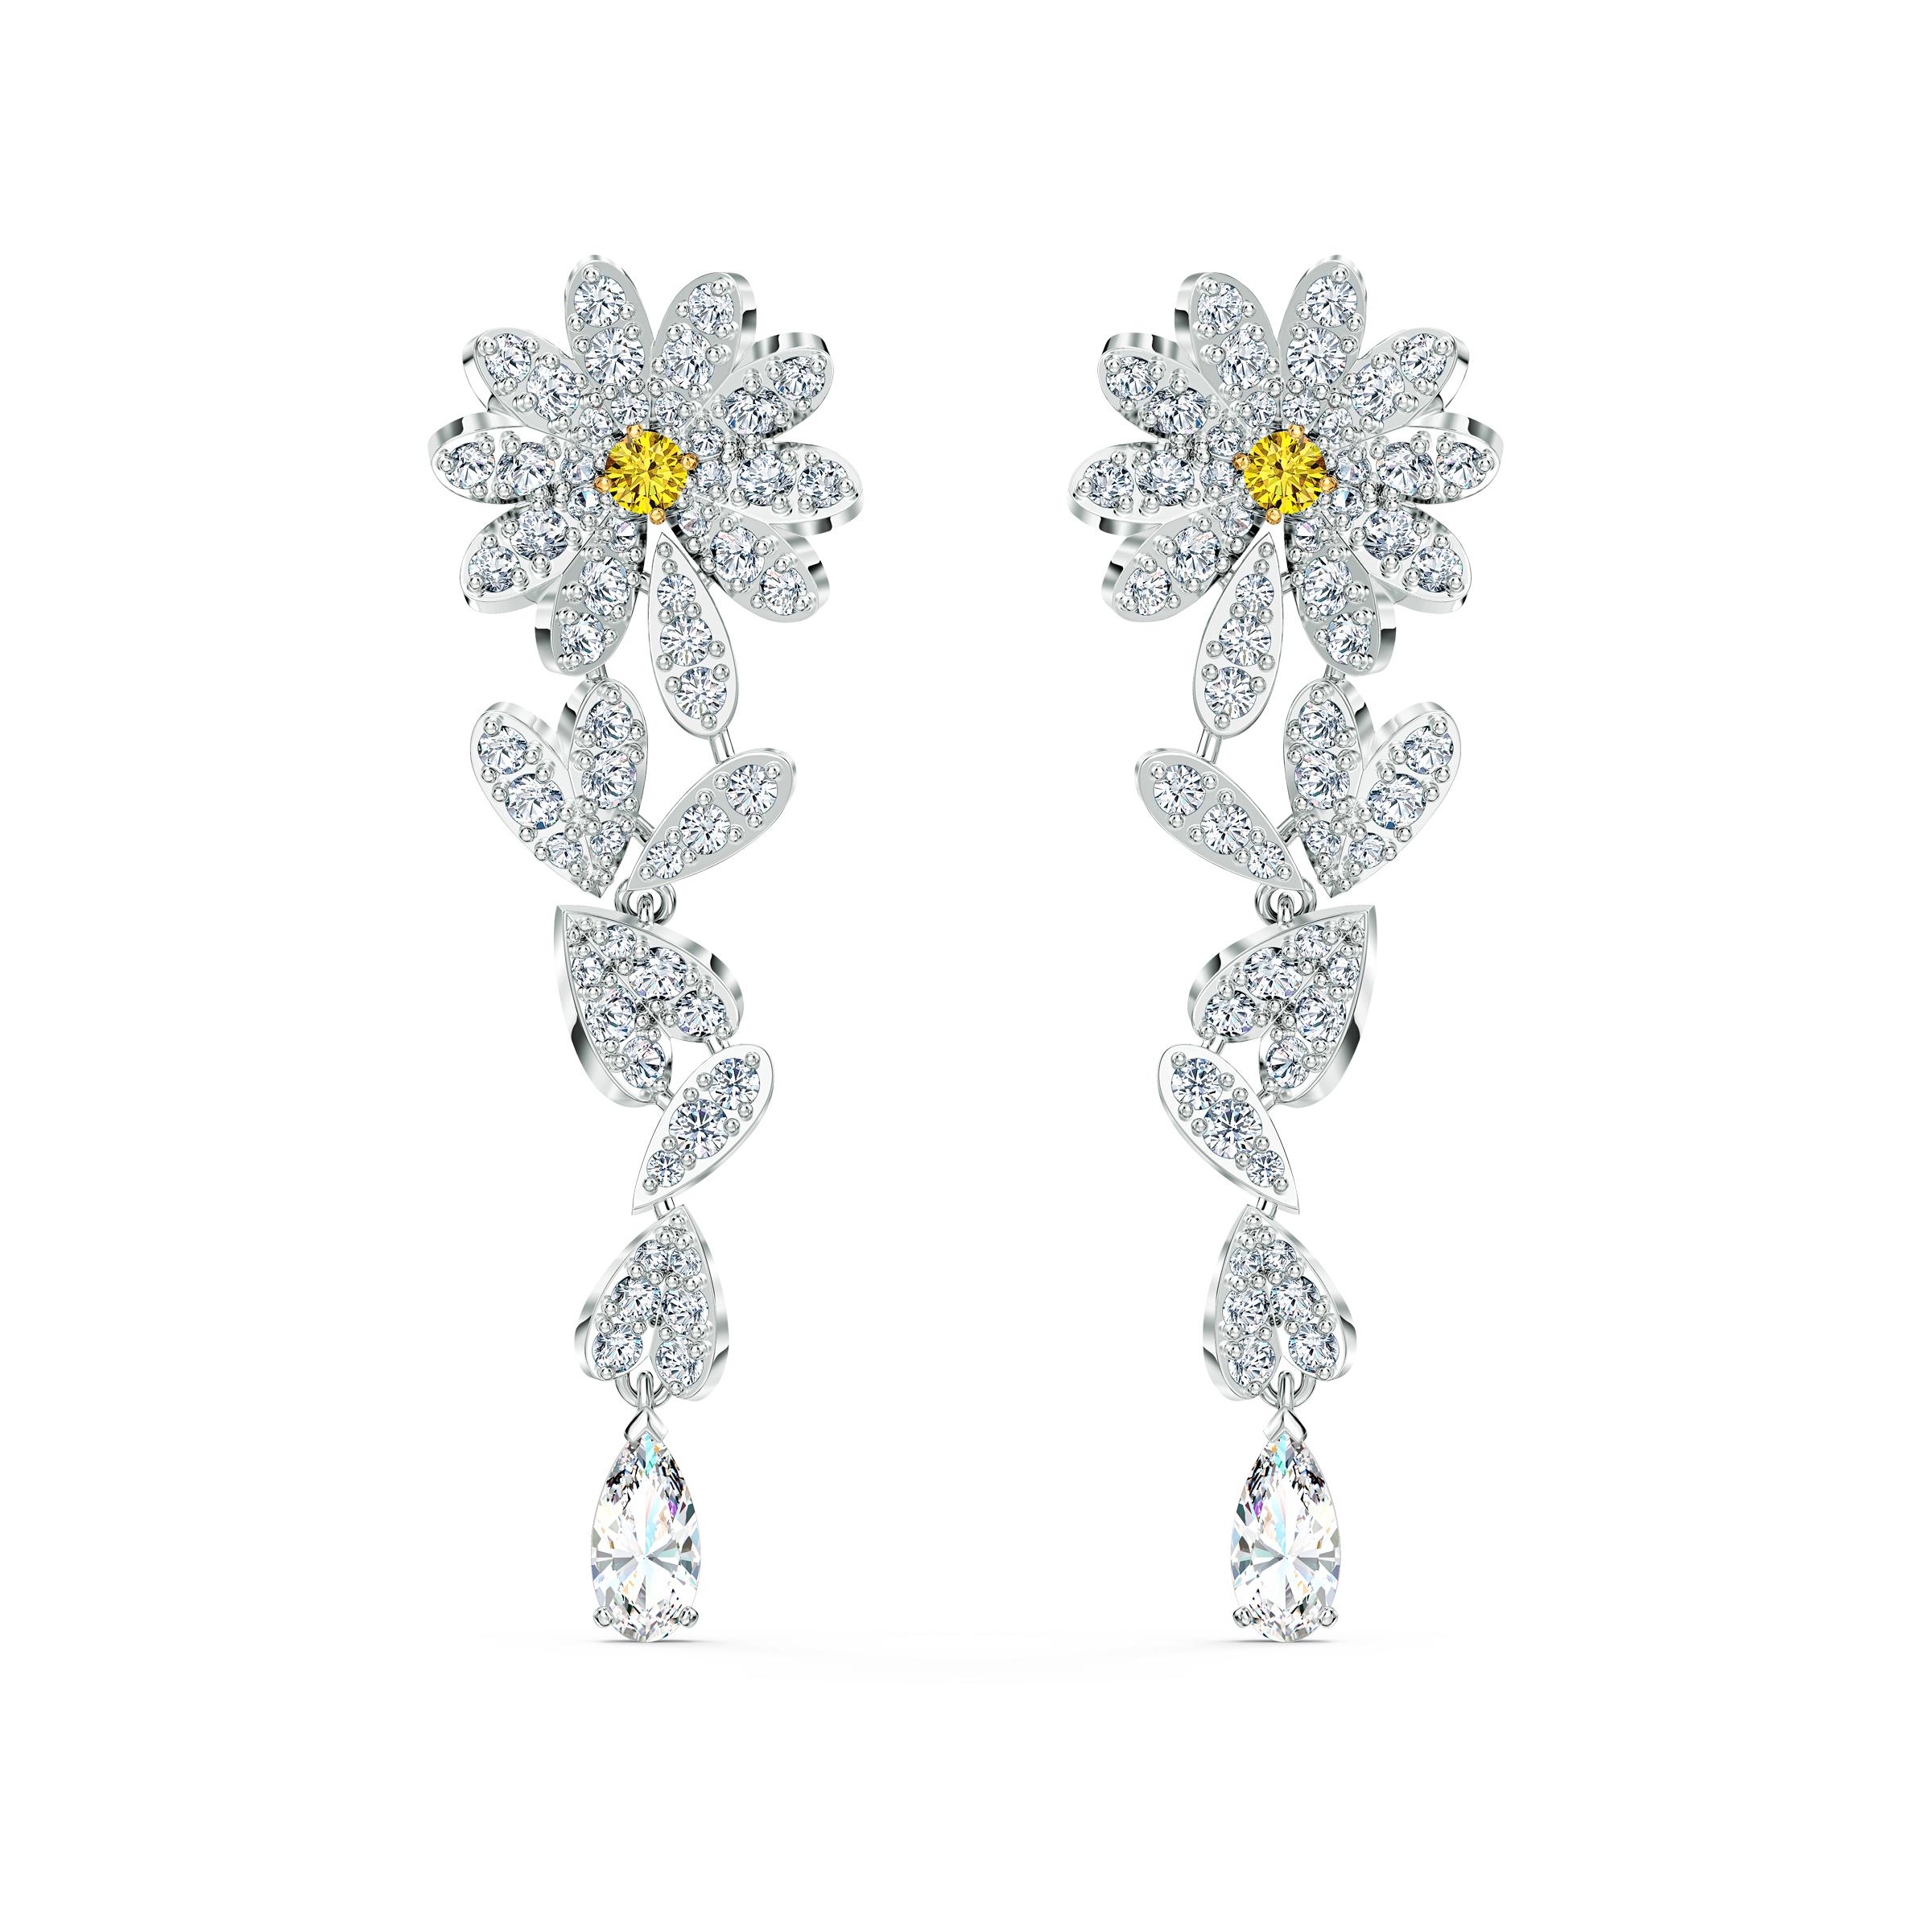 Boucles d'oreilles Eternal Flower, jaune, finition mix de métal, Swarovski